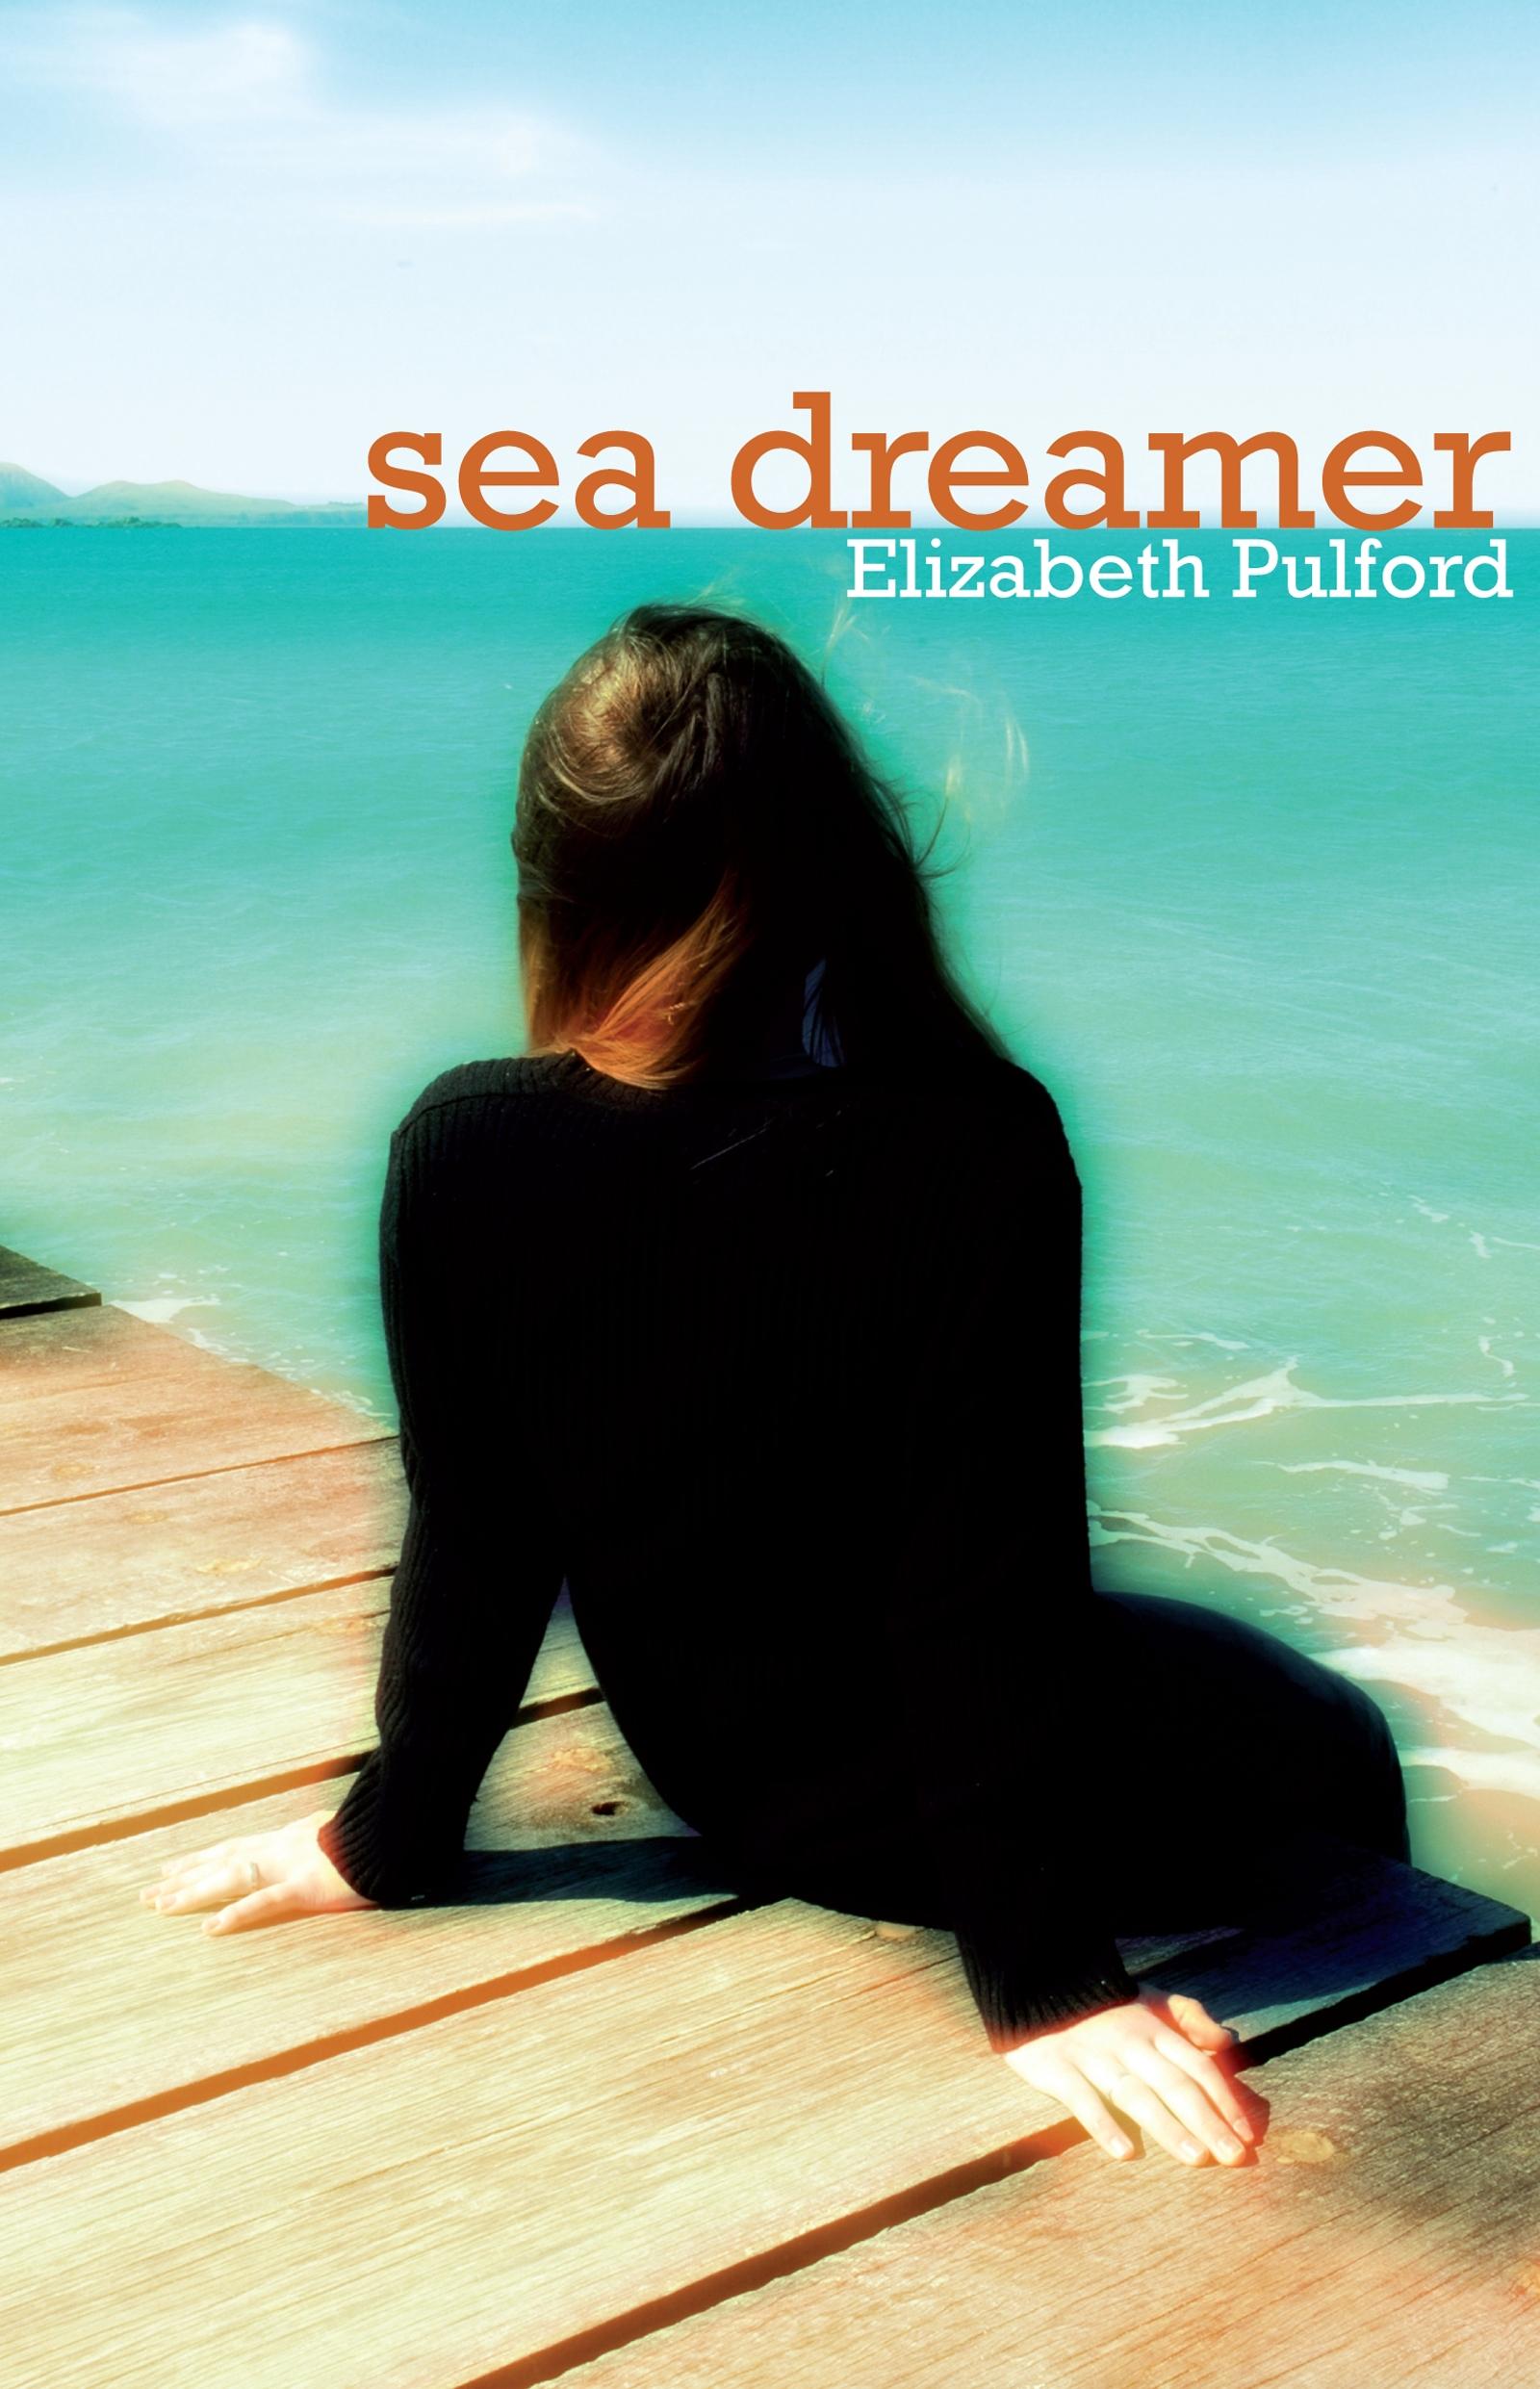 The Sea Dreamer Collection